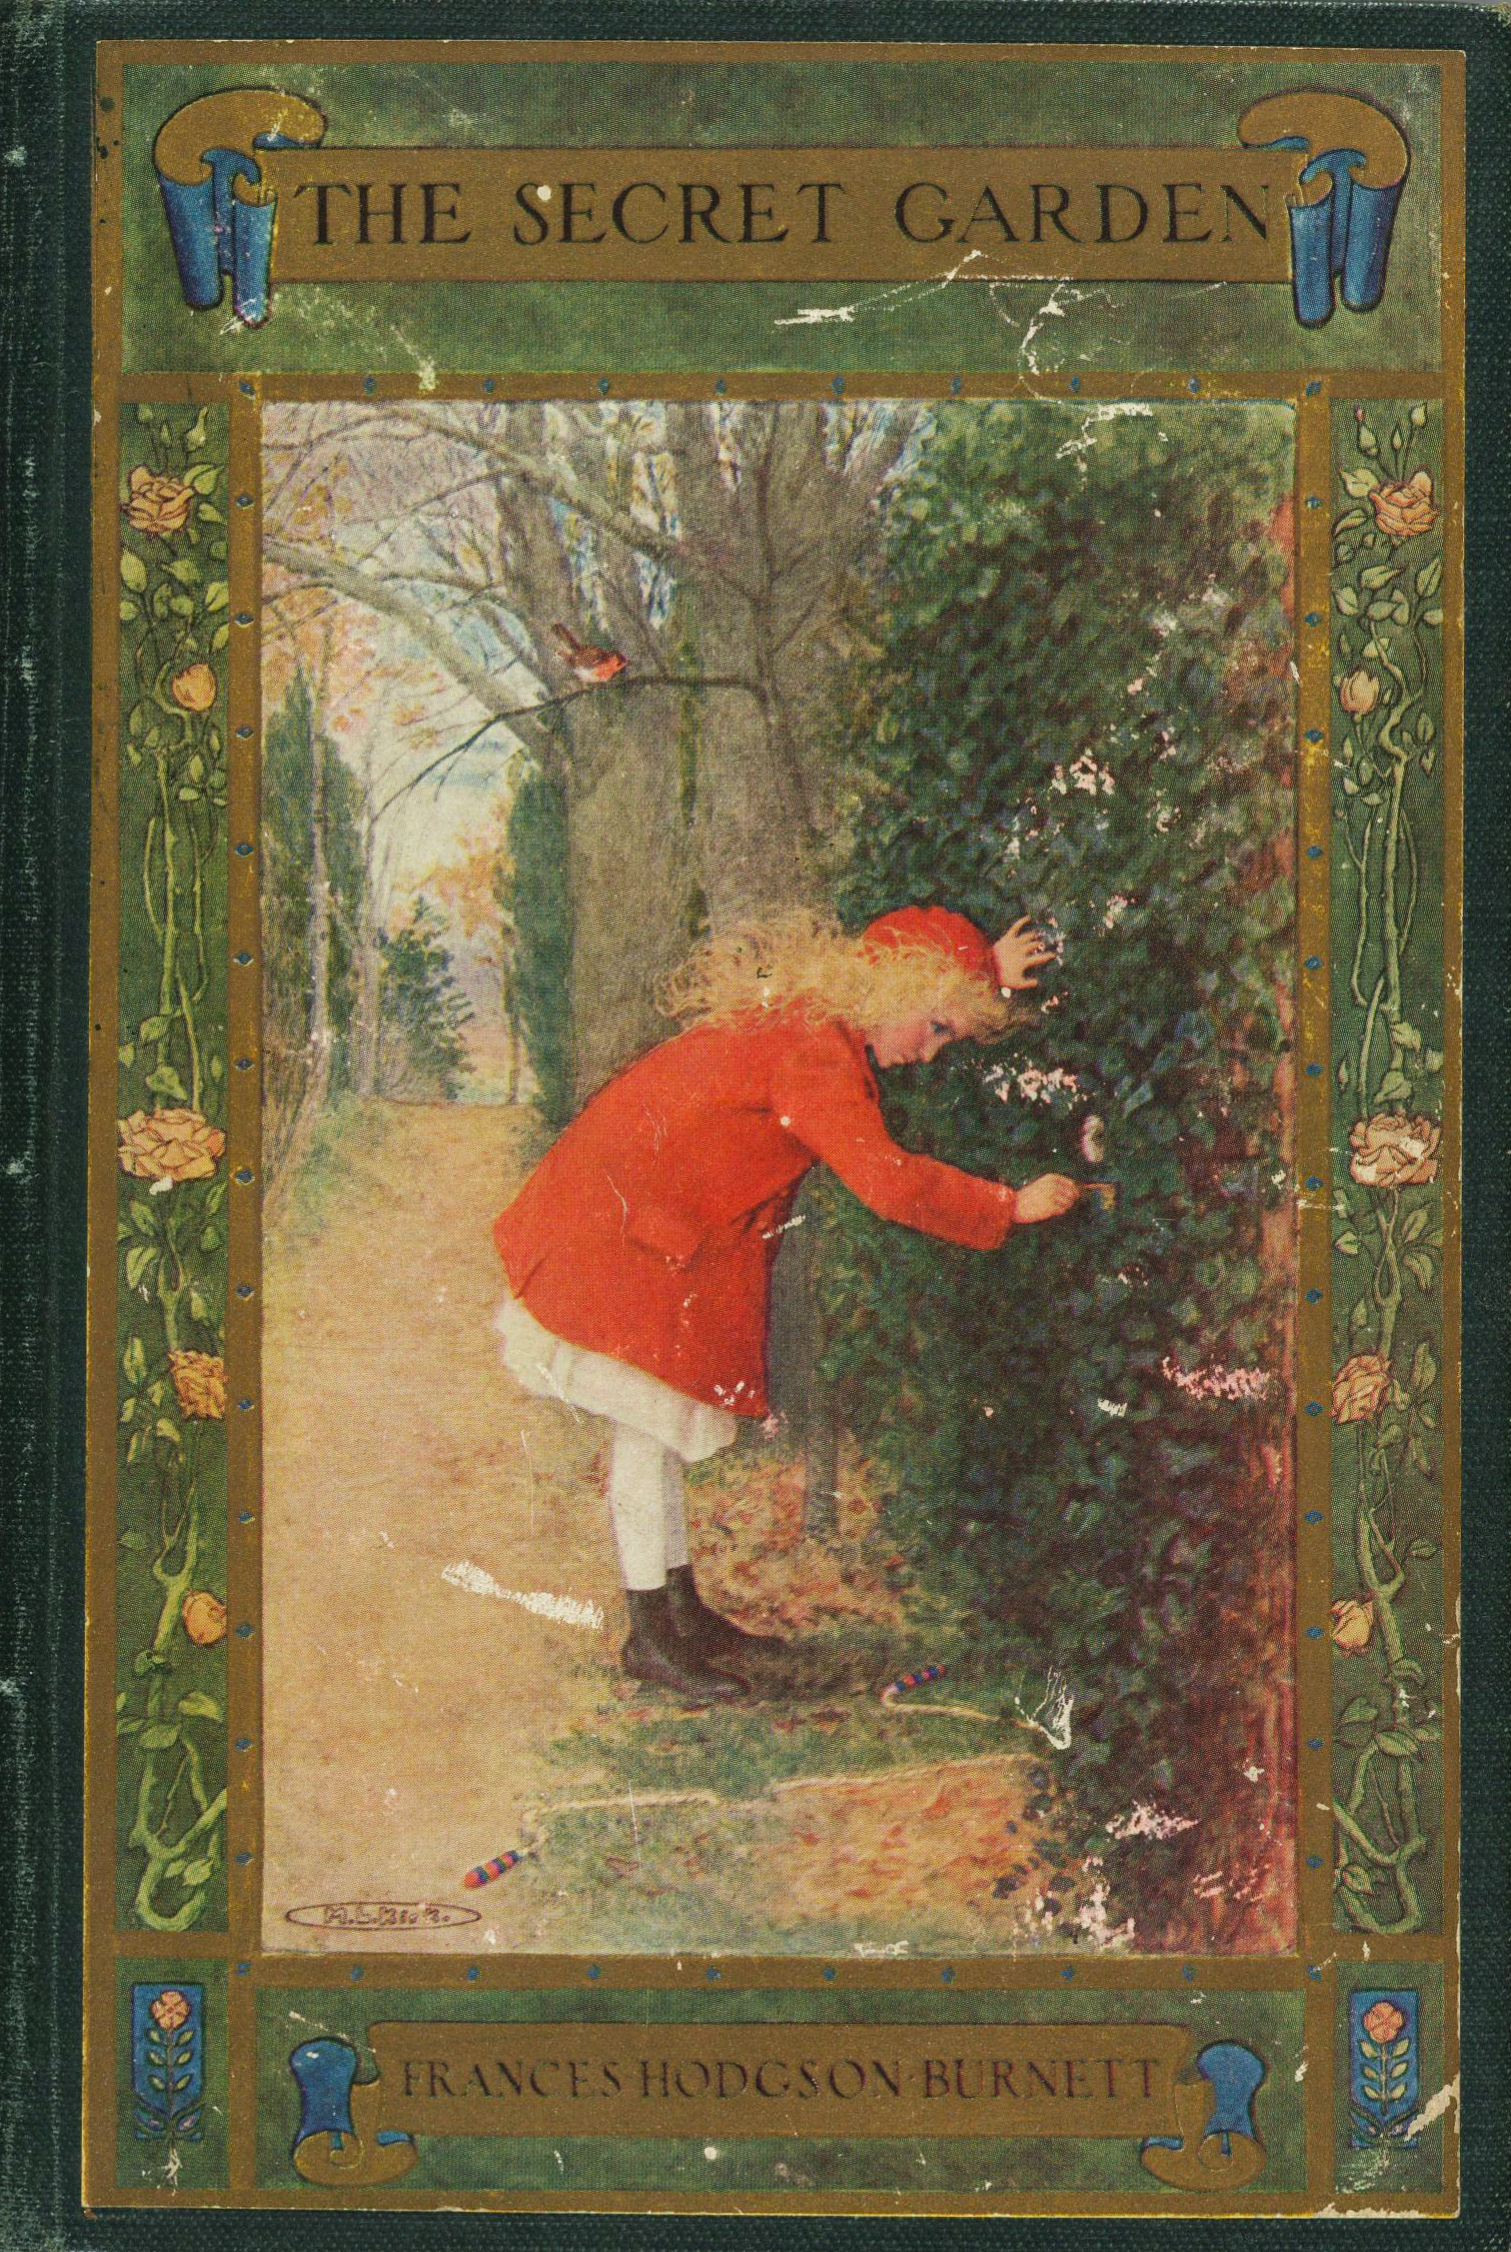 Houghton_AC85_B9345_911s_-_Secret_Garden,_1911_-_cover